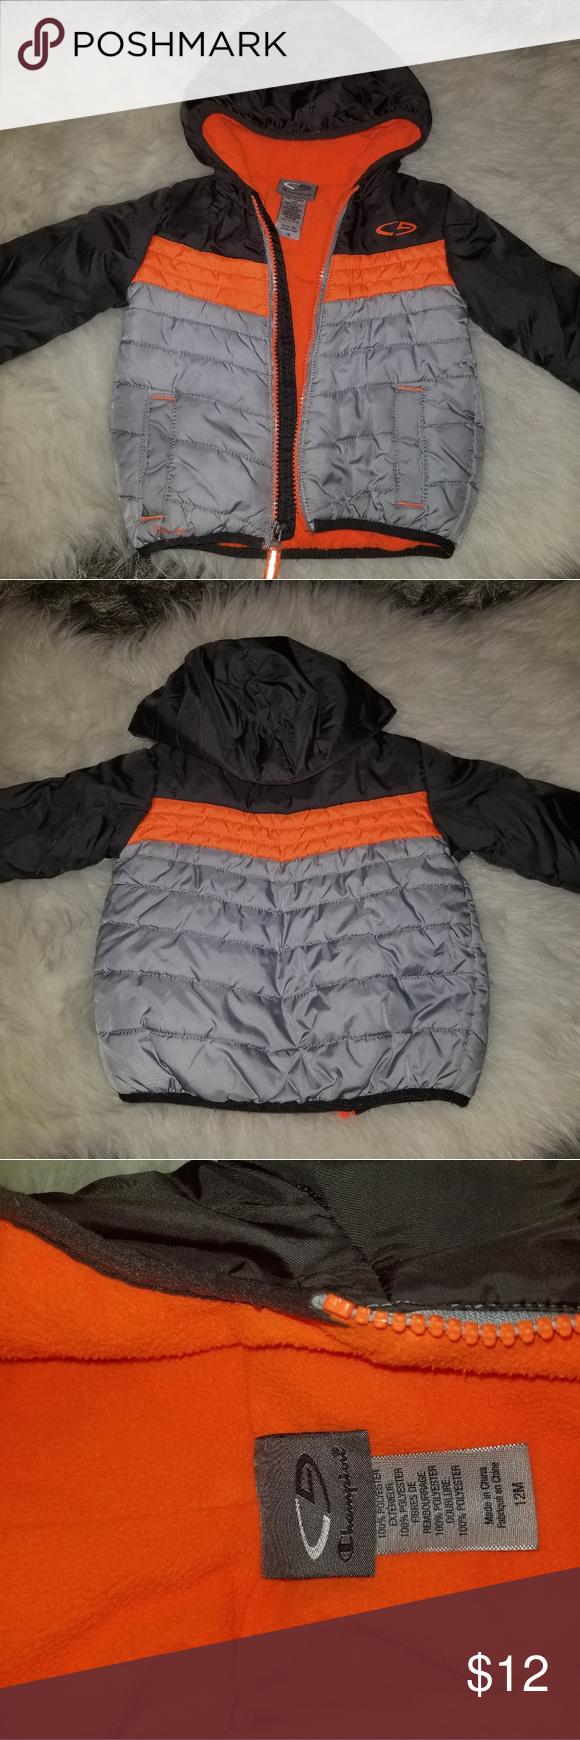 Champion Winter Coat Jacket 12 Months Winter Coats Jackets Winter Coat Champion Jacket [ 1740 x 580 Pixel ]